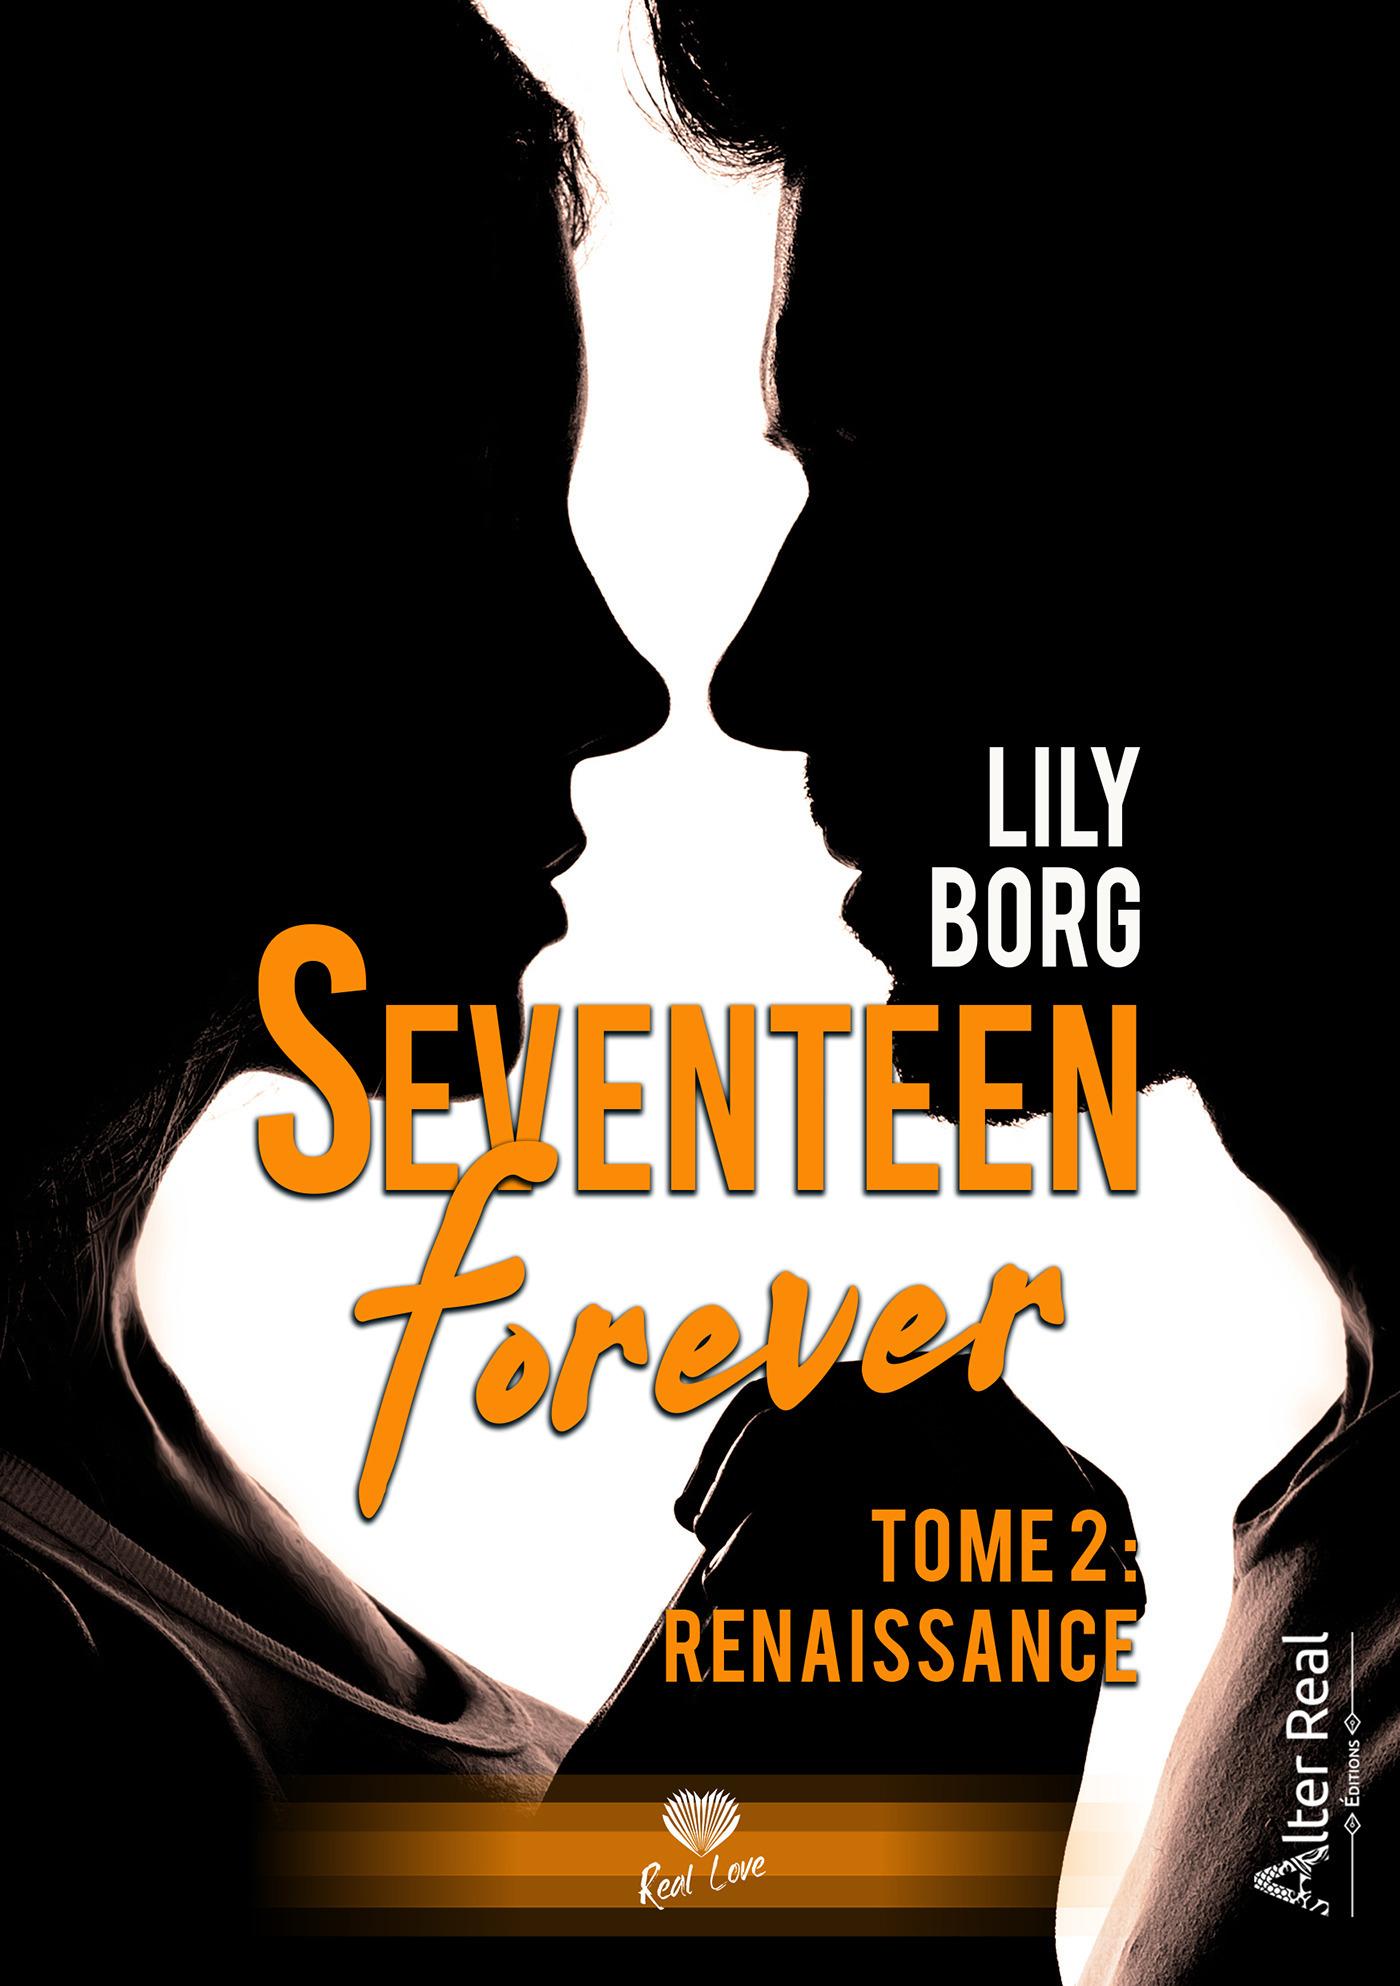 Renaissance  - Lily Borg